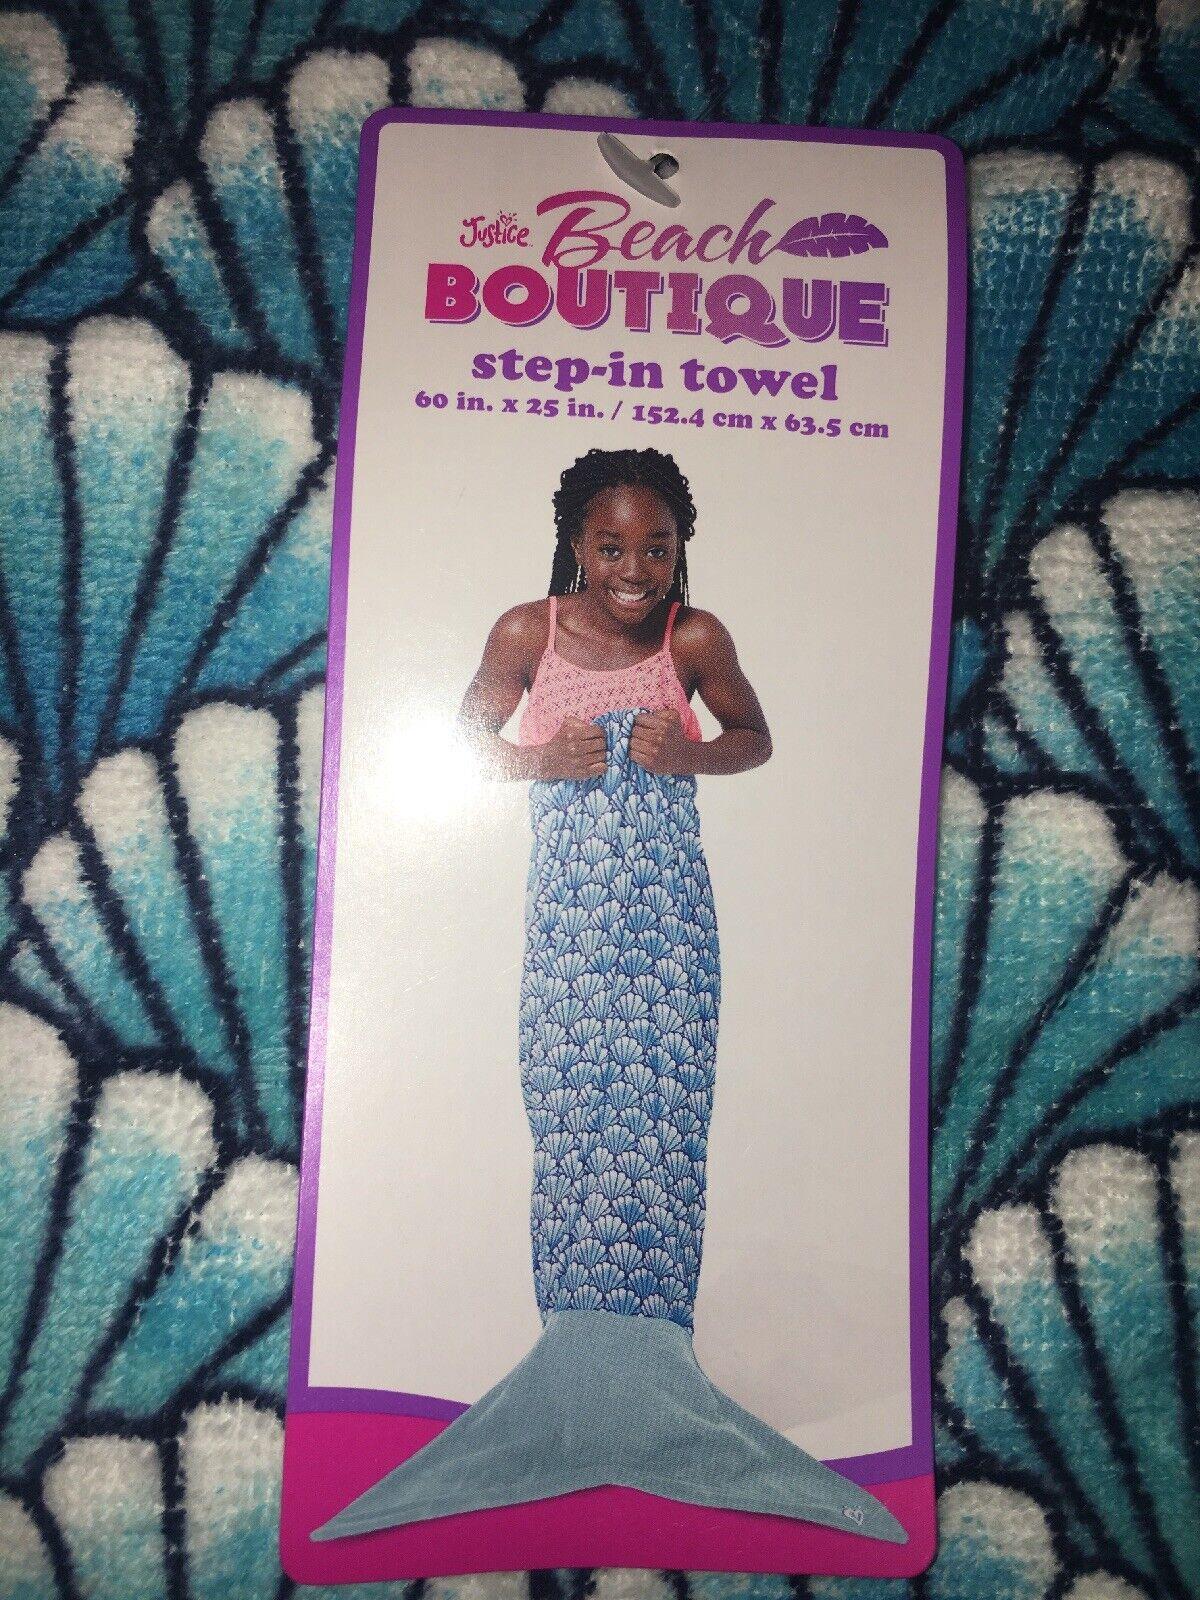 Justice Girls Beach Boutique Pink Step-in Mermaid Towel Swing NWT!